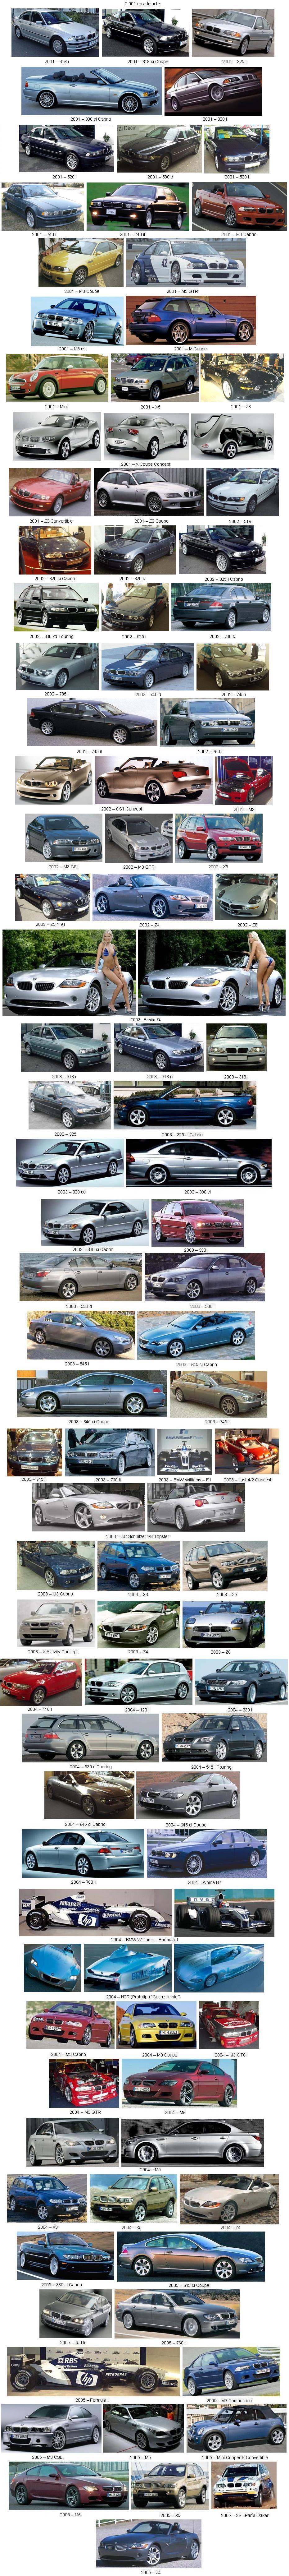 BMW-08-(2001%20en%20adelante) Cool Bmw Z1 Joyas sobre Ruedas Cars Trend